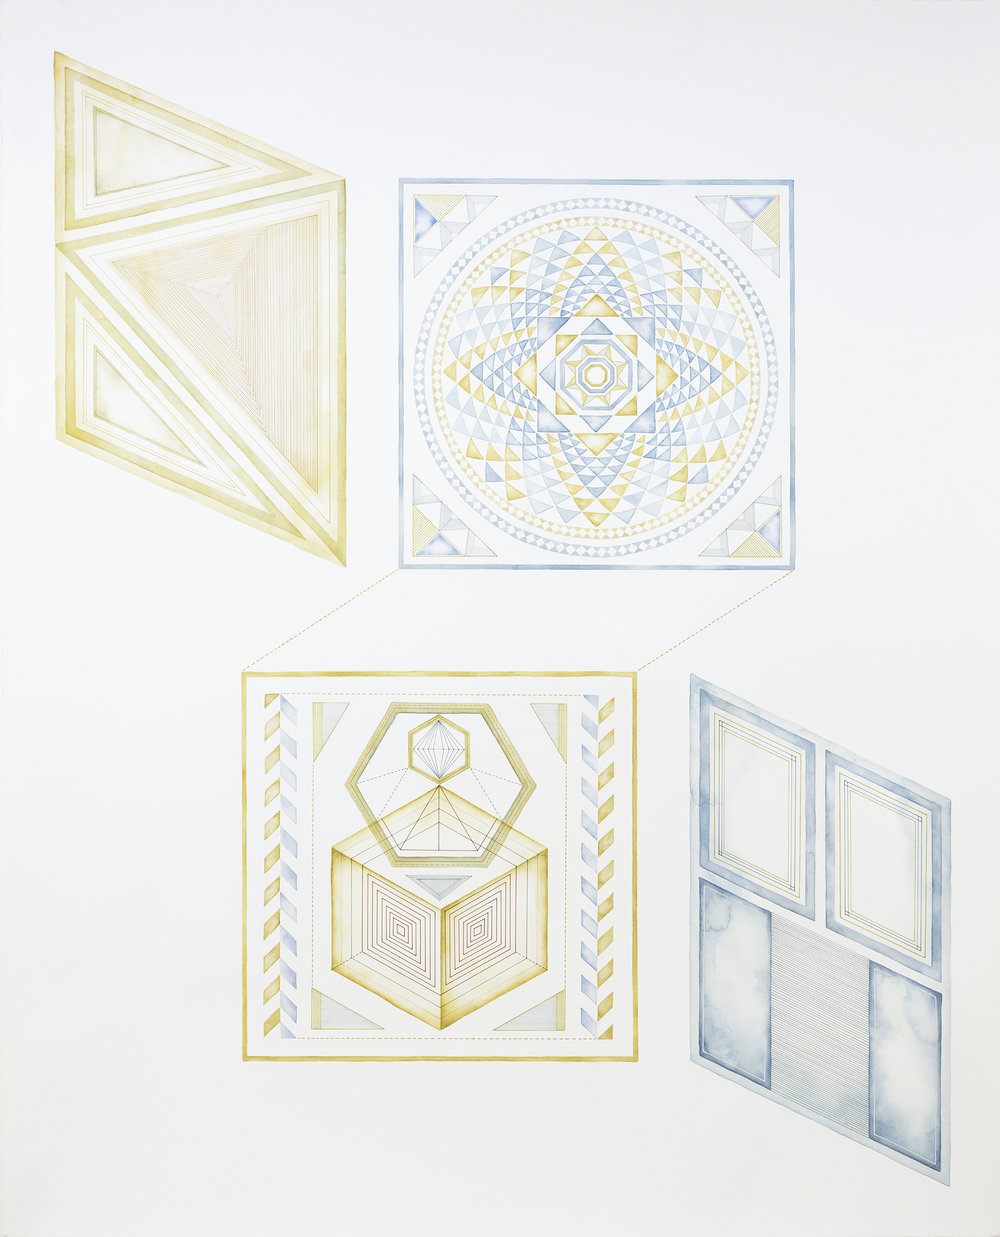 Yuria Okamura,Wander 1, 2015, acrylic and ink on paper, 120 x 96 cm